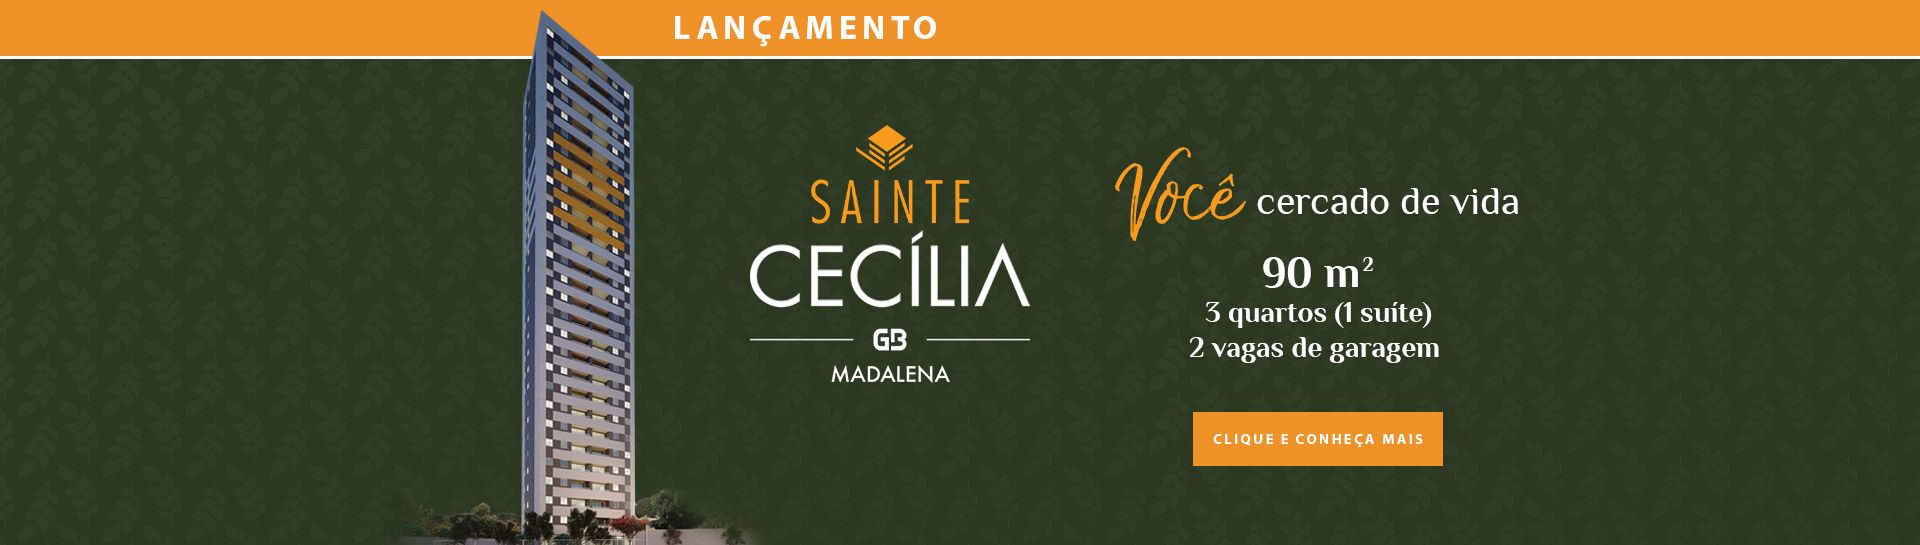 Lançamento<br /> Sainte Cecília